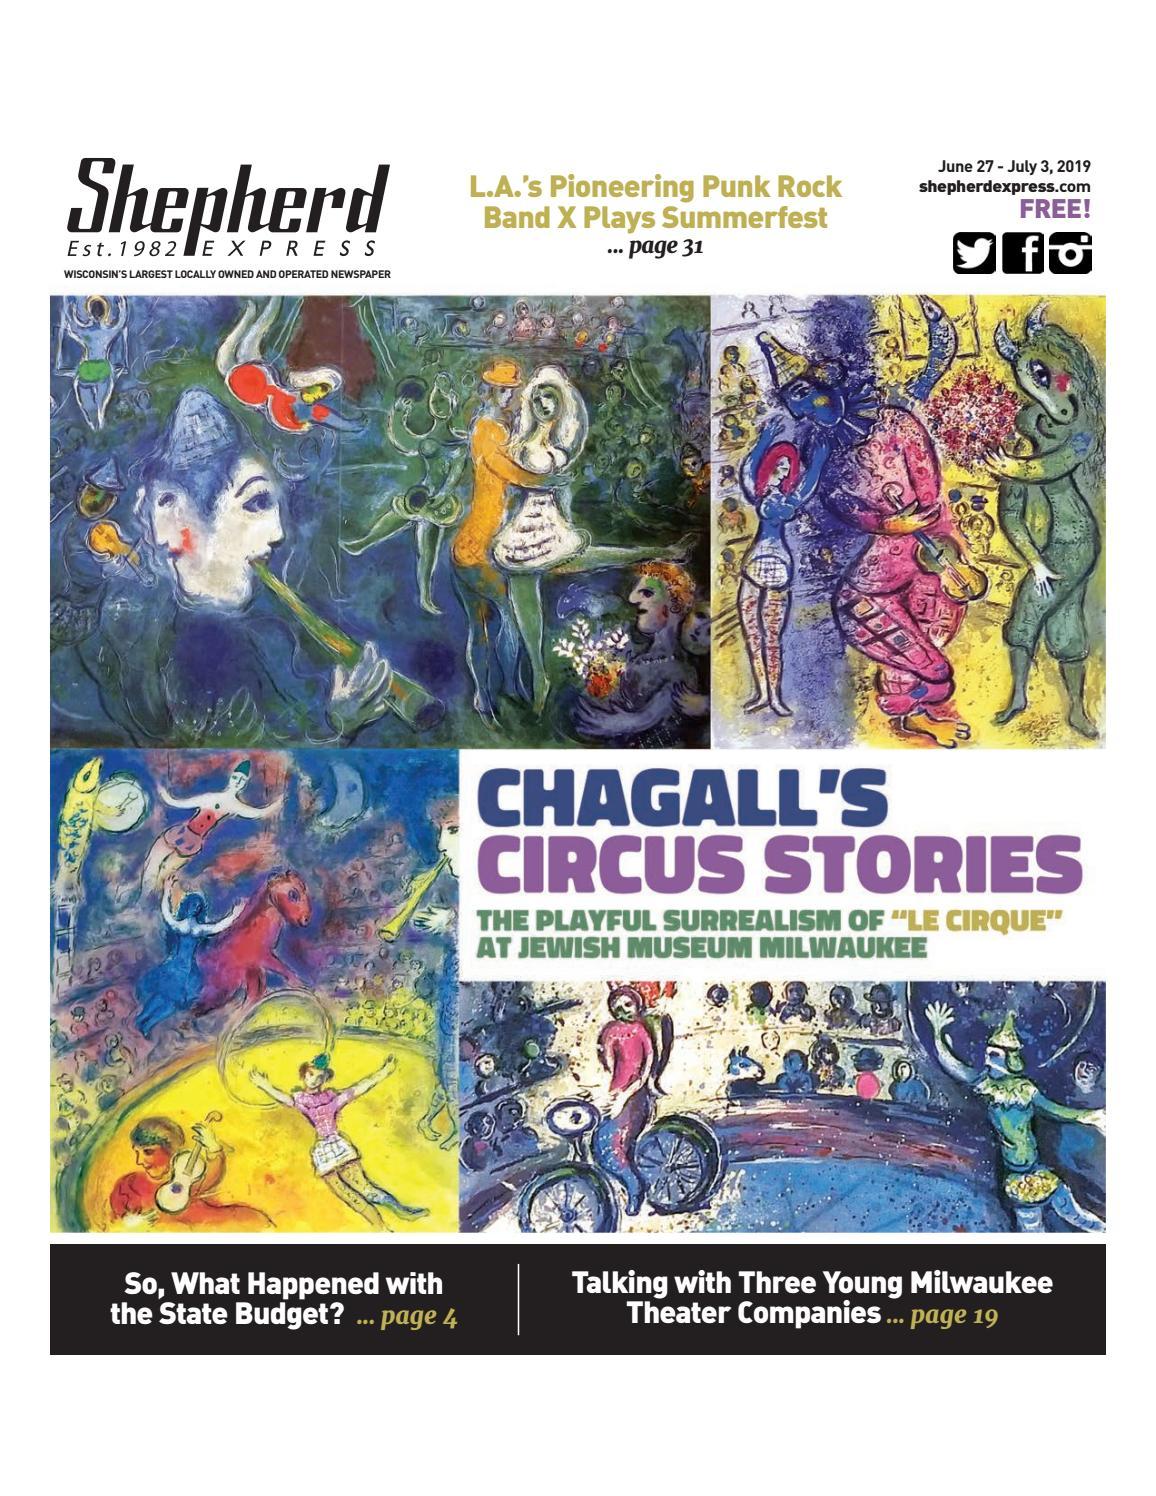 Print Edition: June 27, 2019 by Shepherd Express - issuu